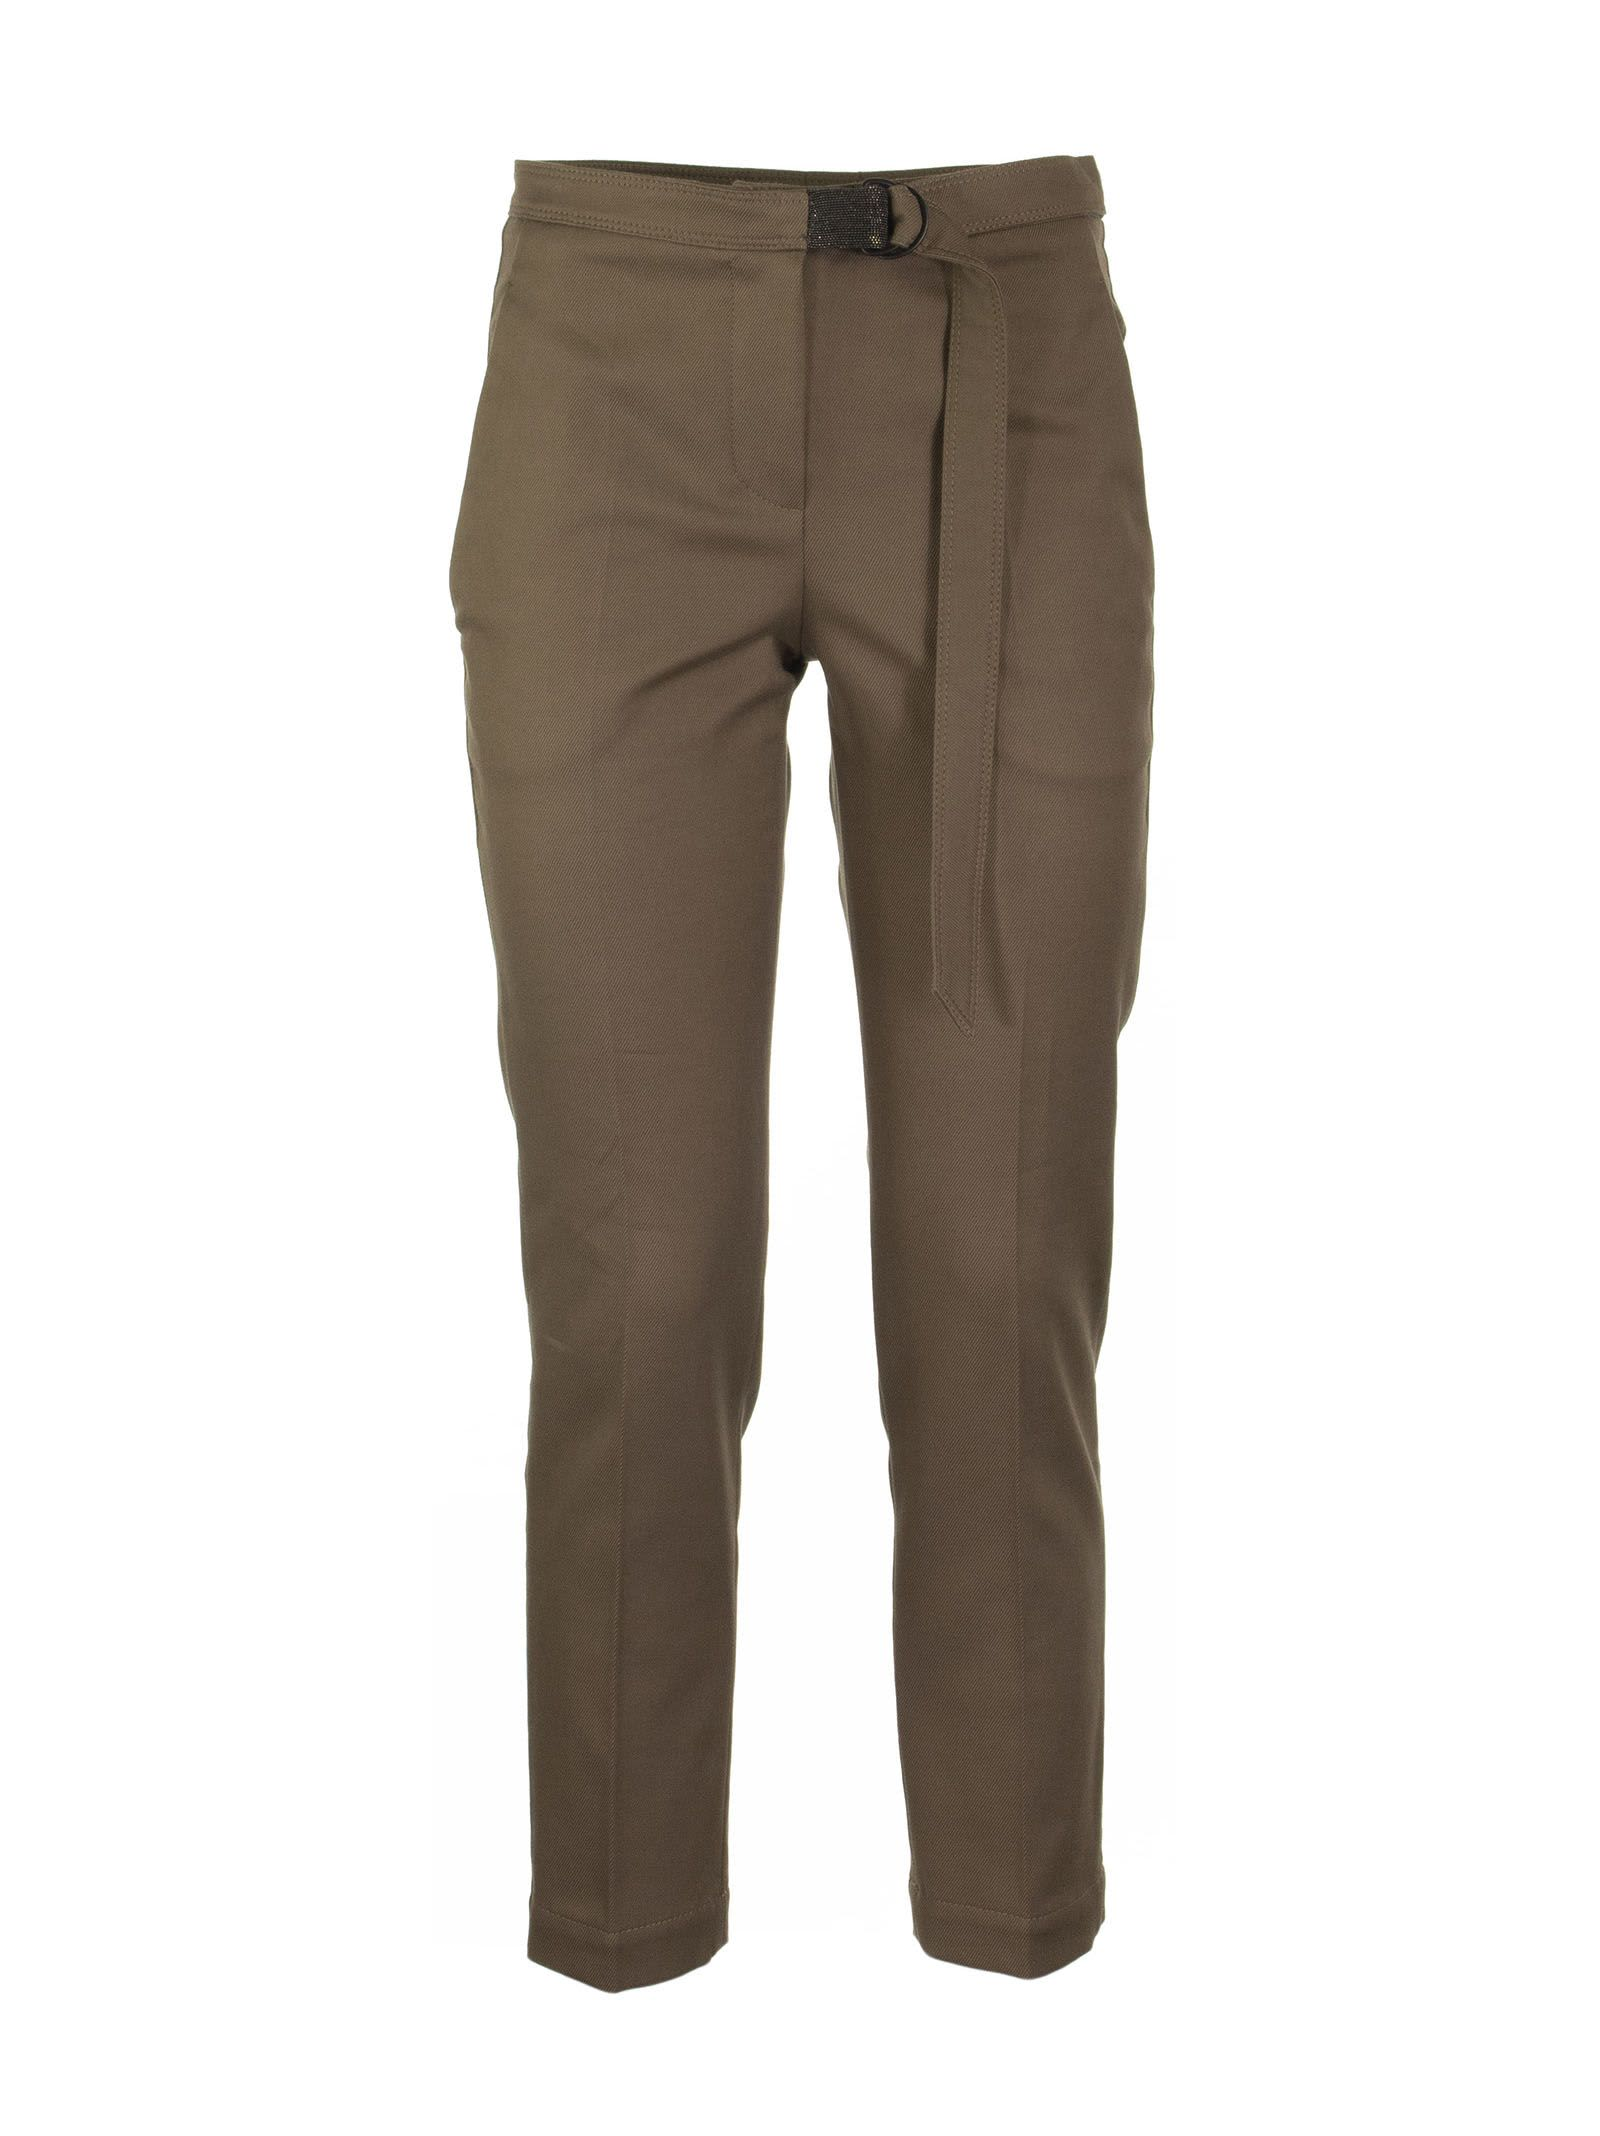 Brunello Cucinelli Trousers Light Brown